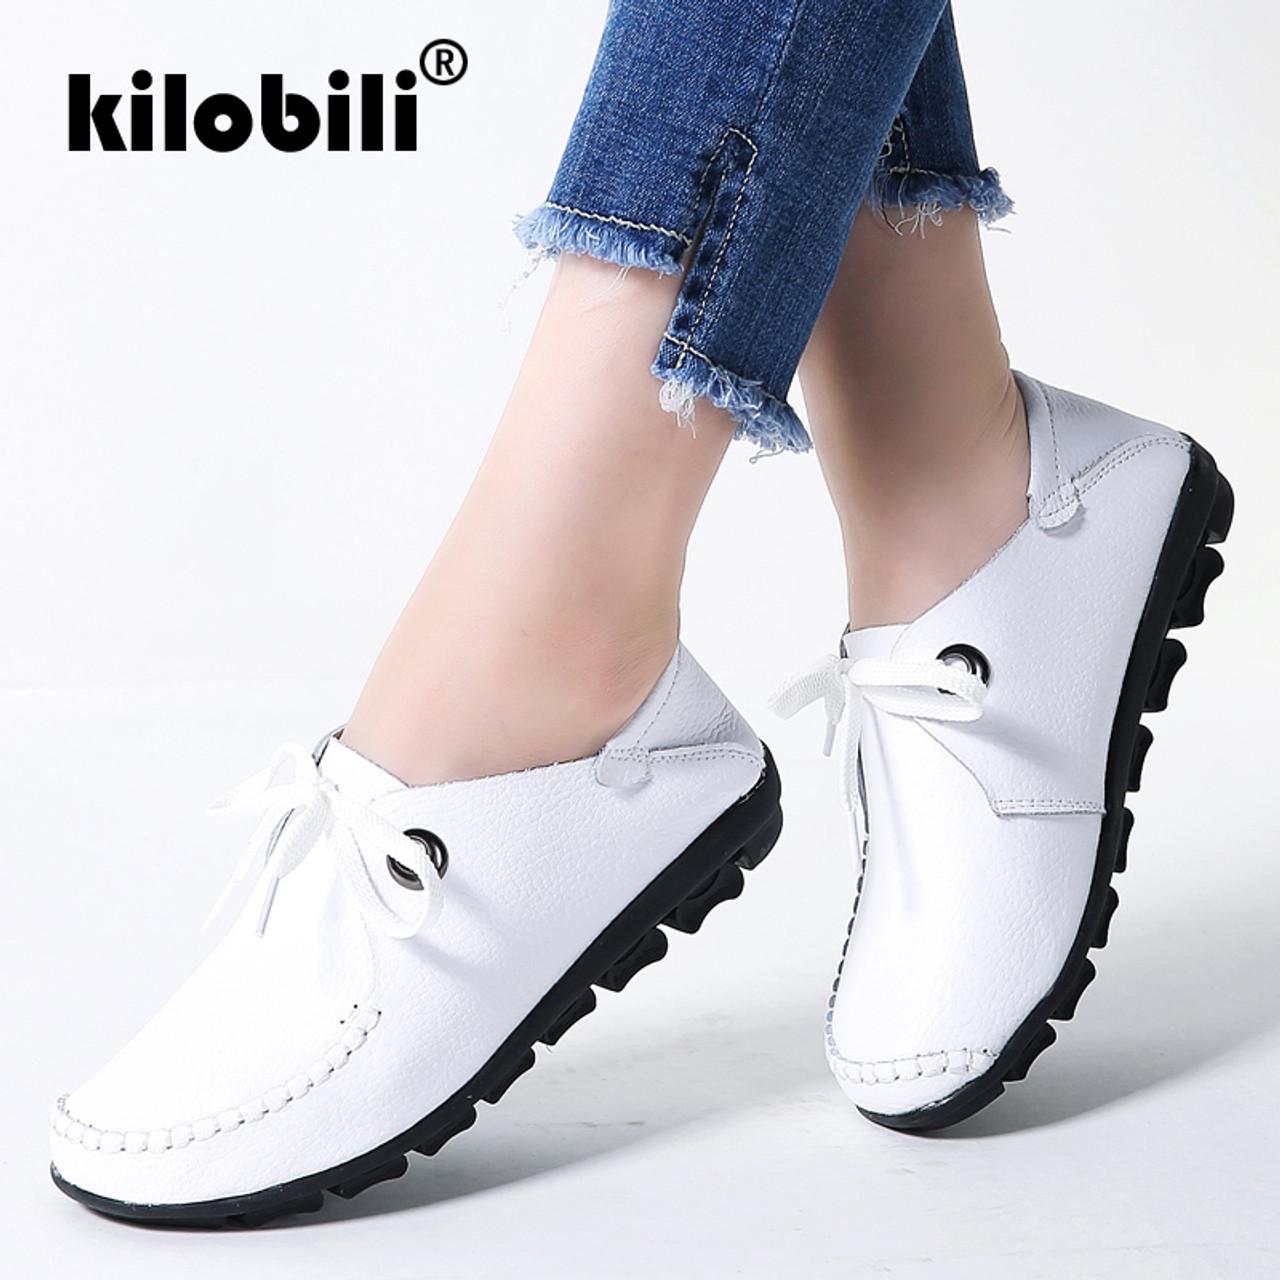 fc46596c60c kilobili 2018 Spring women flats shoes women oxford lace up ballet flats  moccasins White boat shoes ladies lazy loafers shoes - OnshopDeals.Com